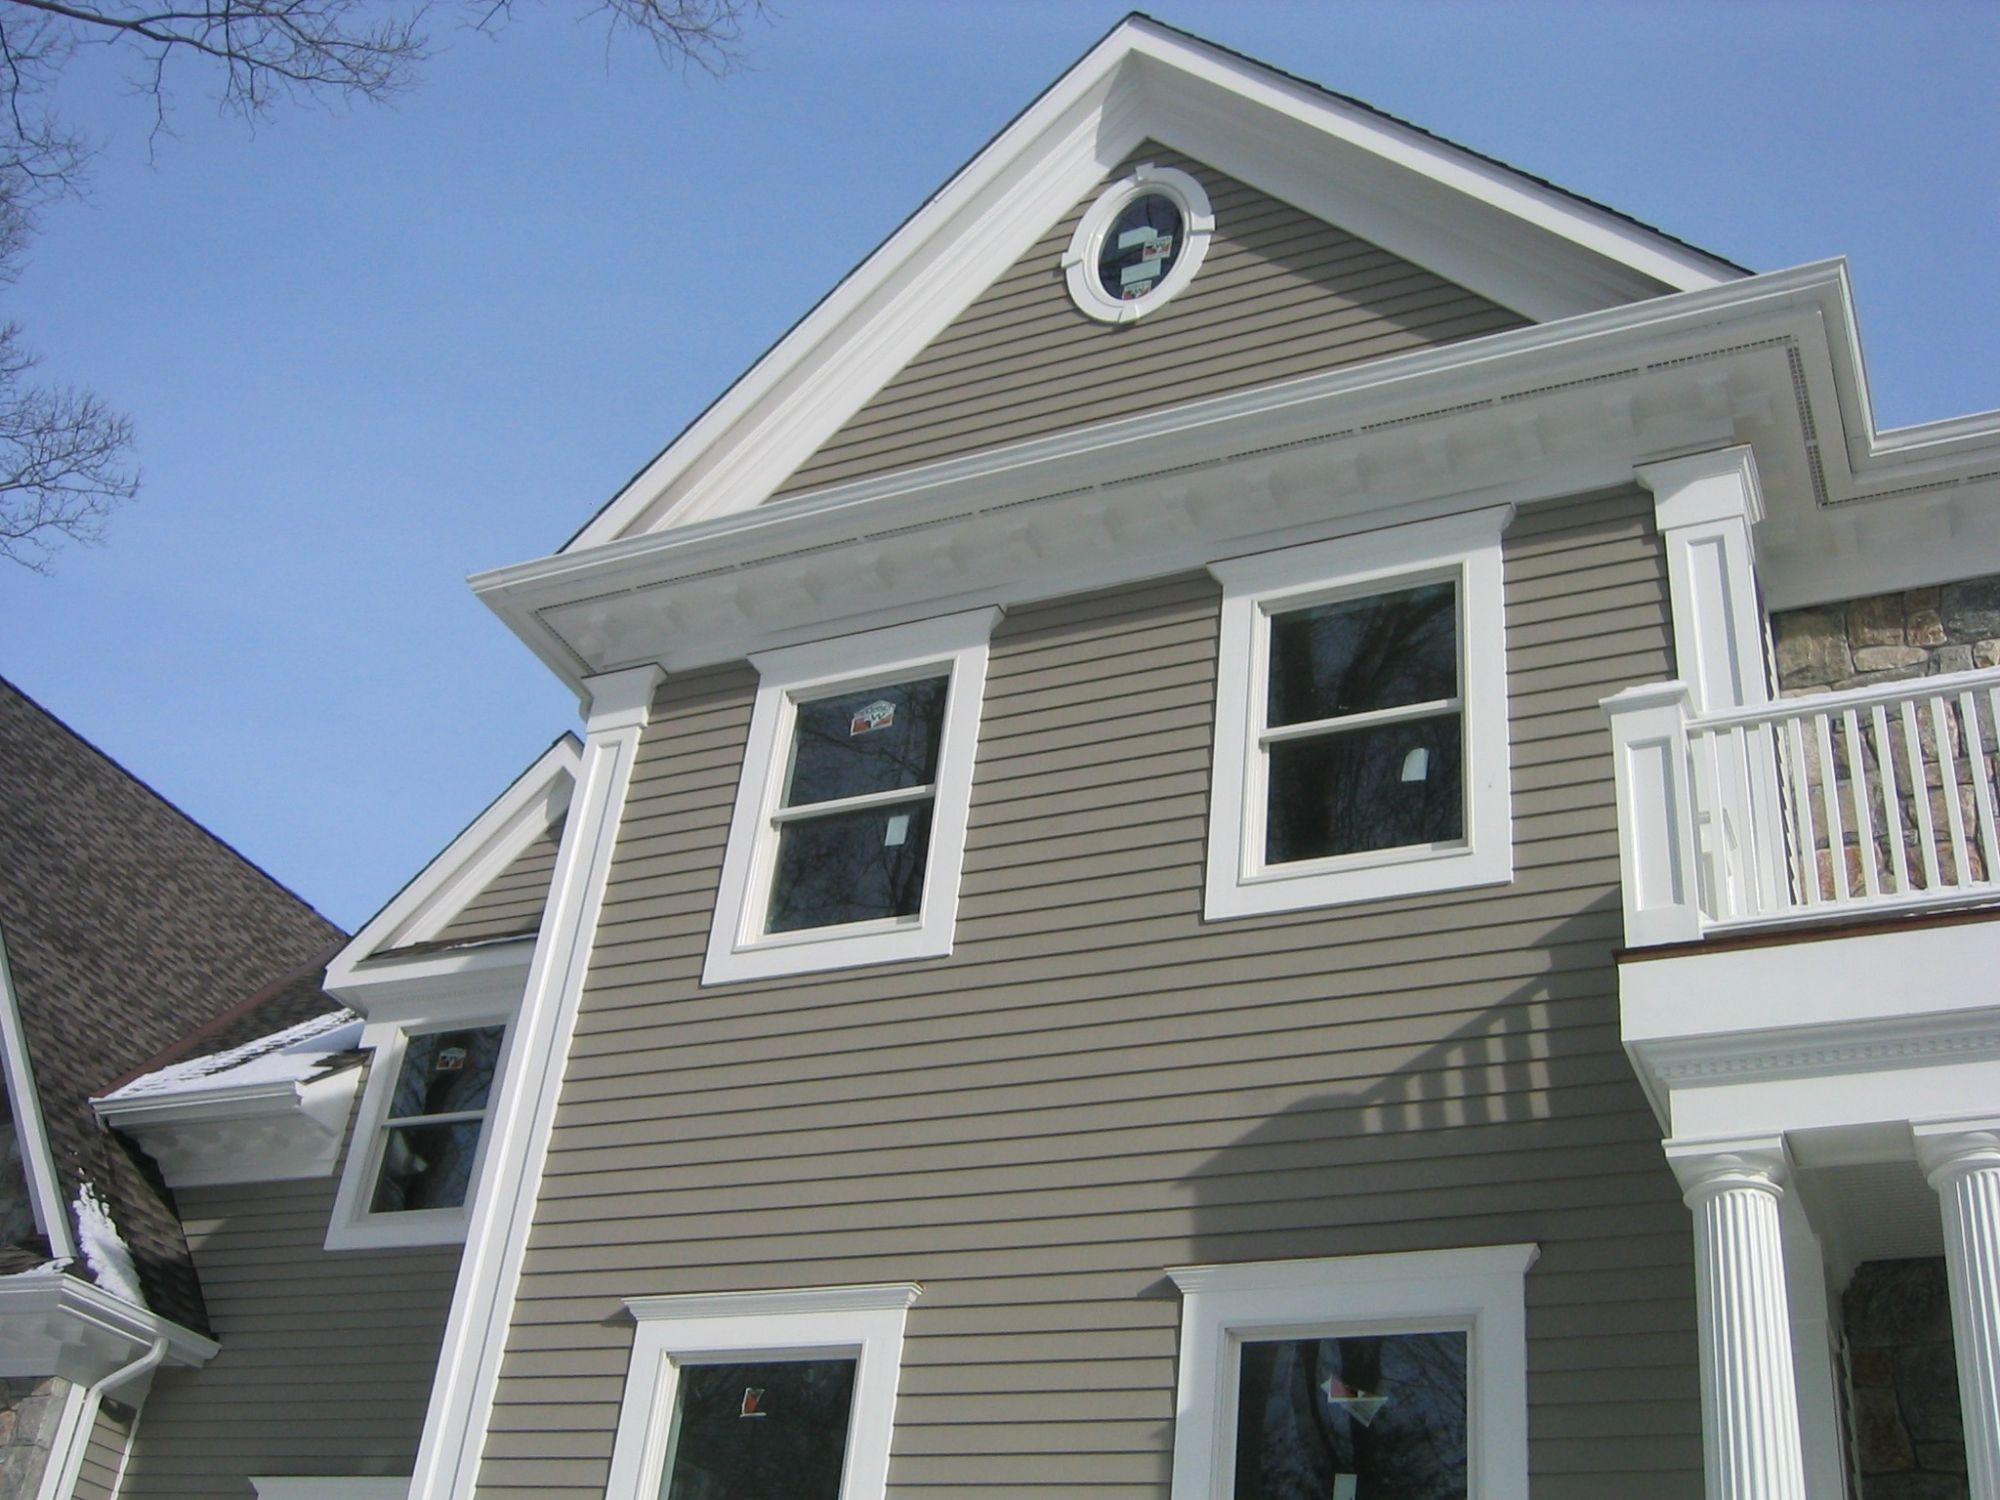 Westchester Ny Siding Replacement Installation Comapny Siding Contractors Siding Vinyl Siding Installation